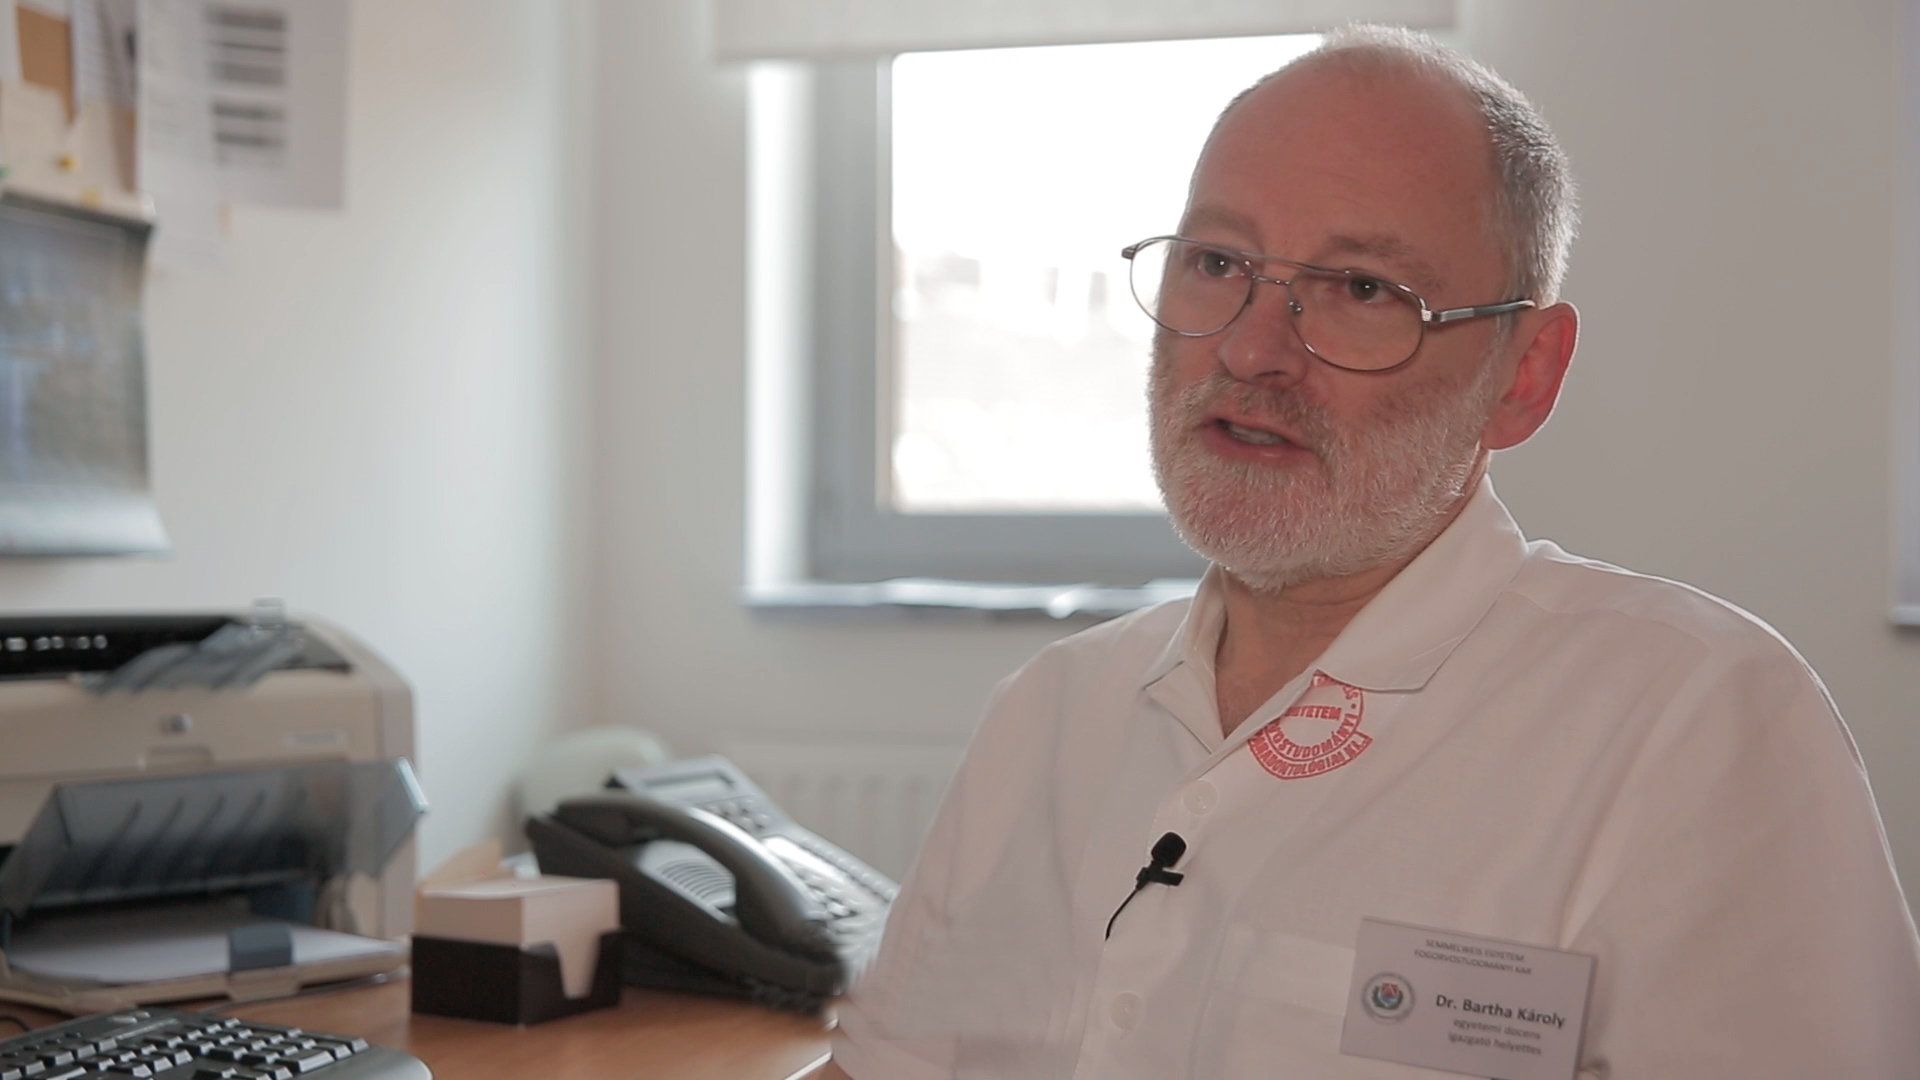 Interjú dr. Bartha Károllyal a VII. Upgrade Konferencia kapcsán